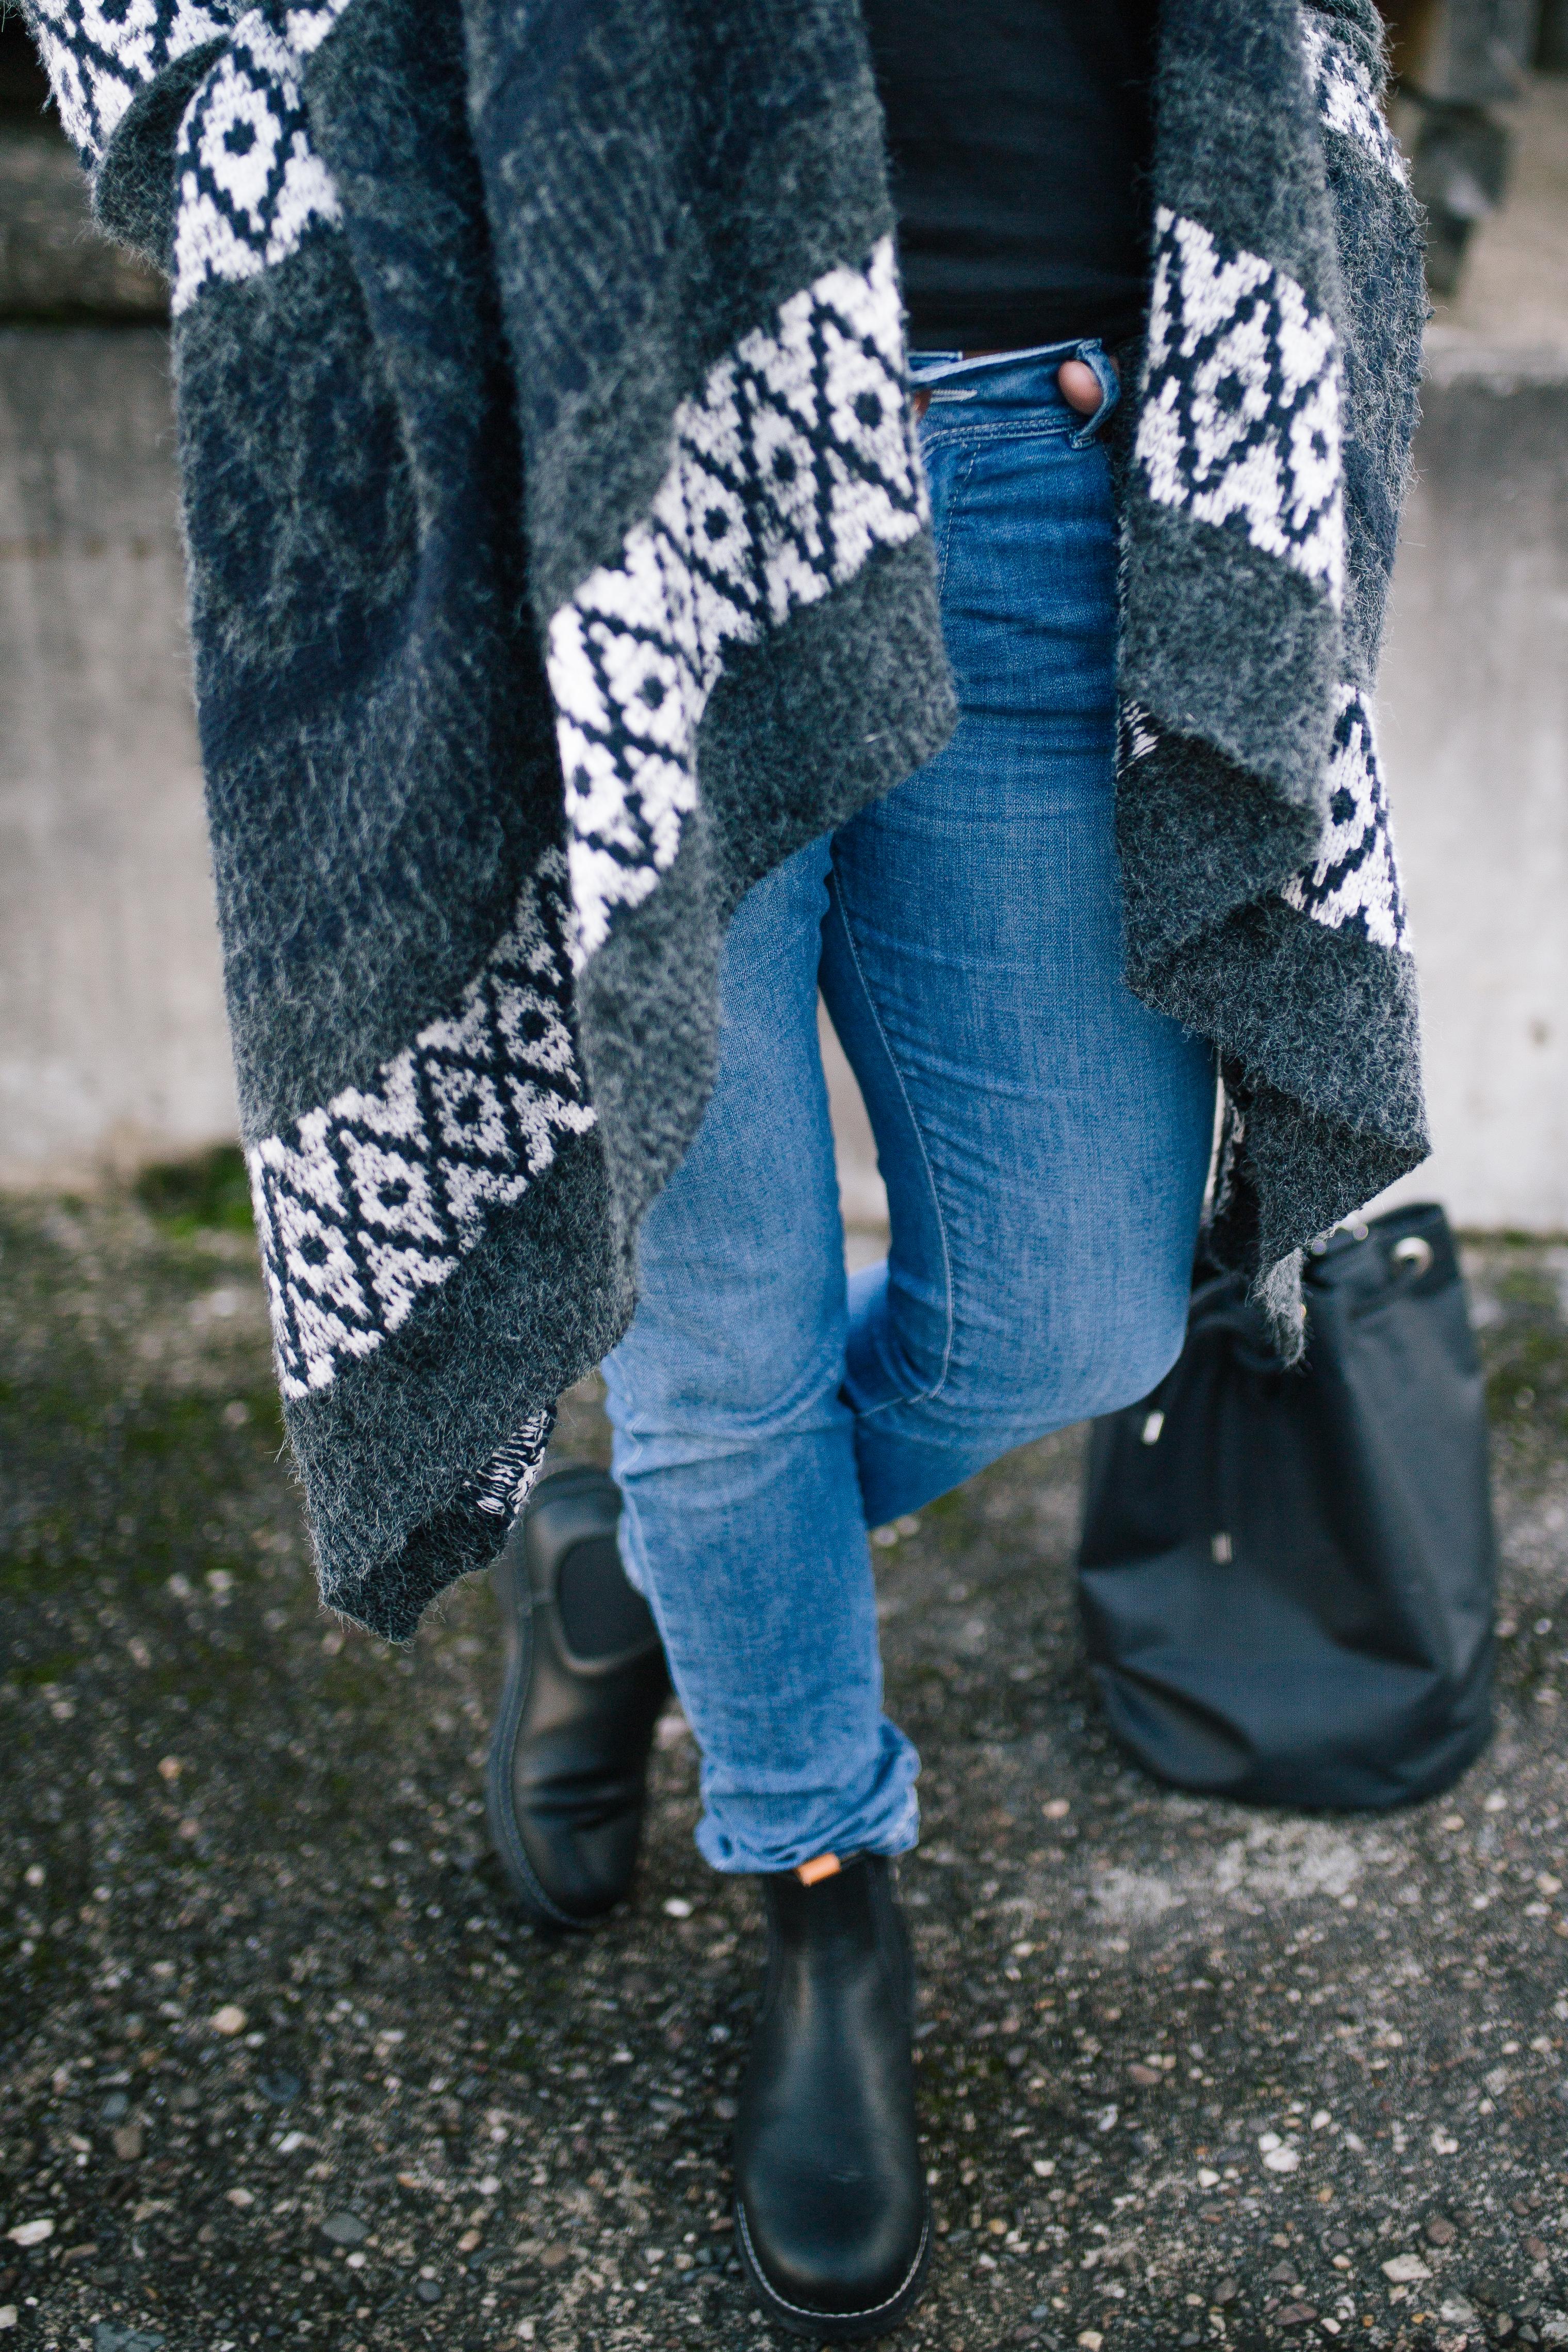 Alltags-Herbst-Outfit mit fairen Marken